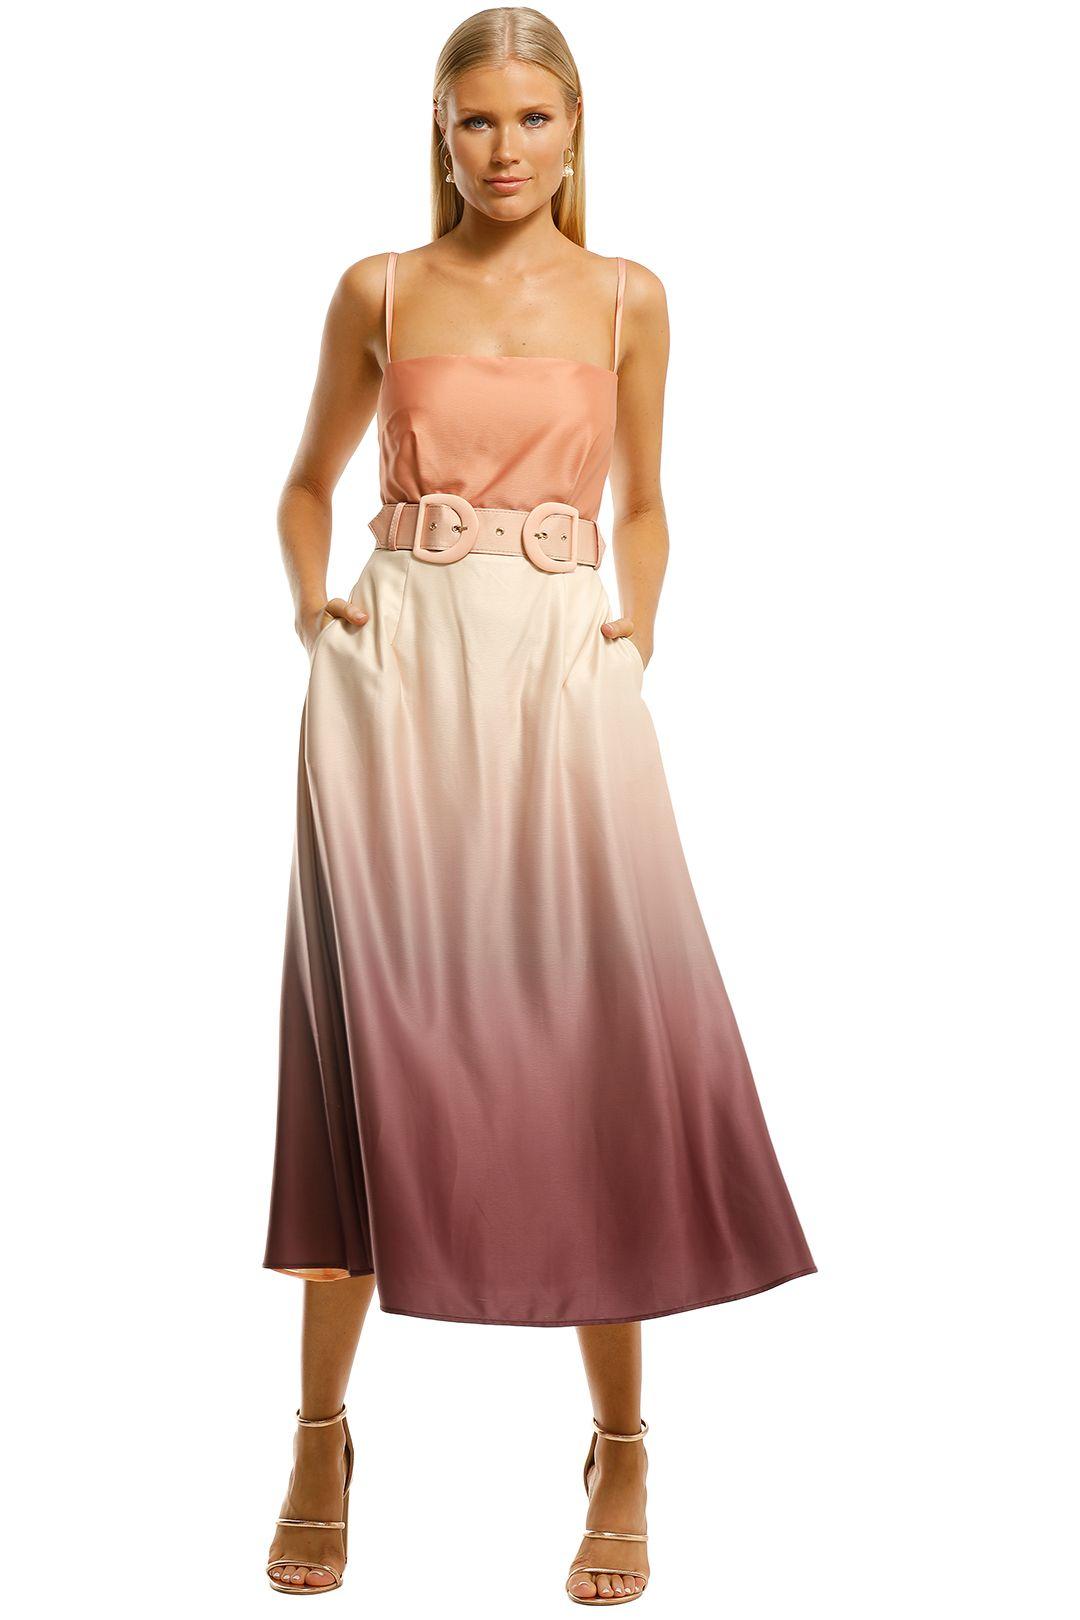 Pasduchas-Afterglow-Midi-Dress-Ombre-Front